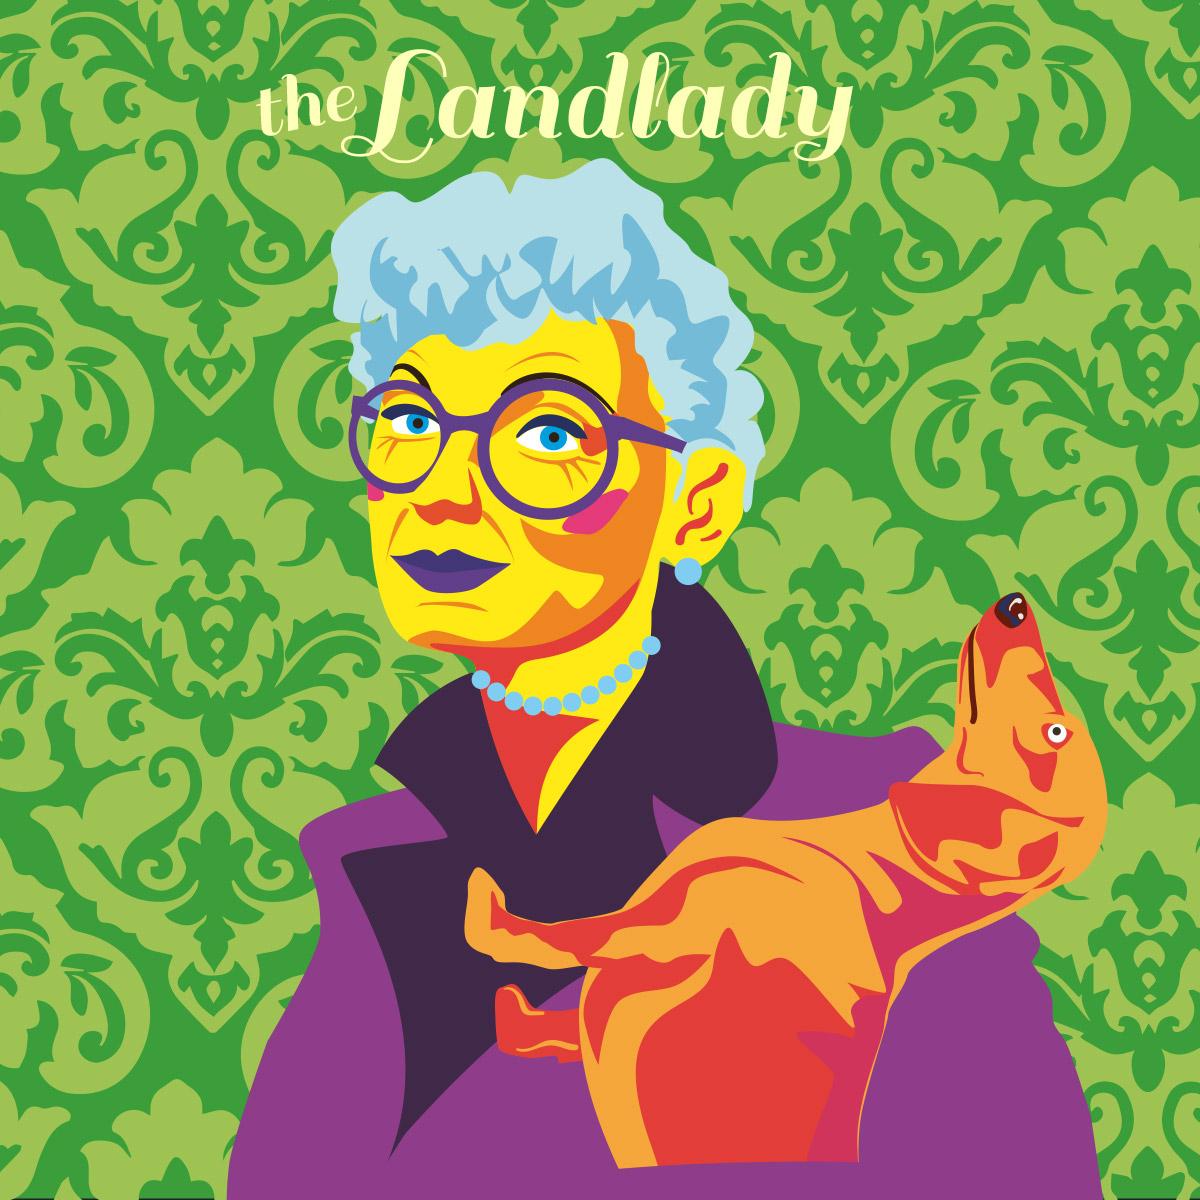 WM_landlady